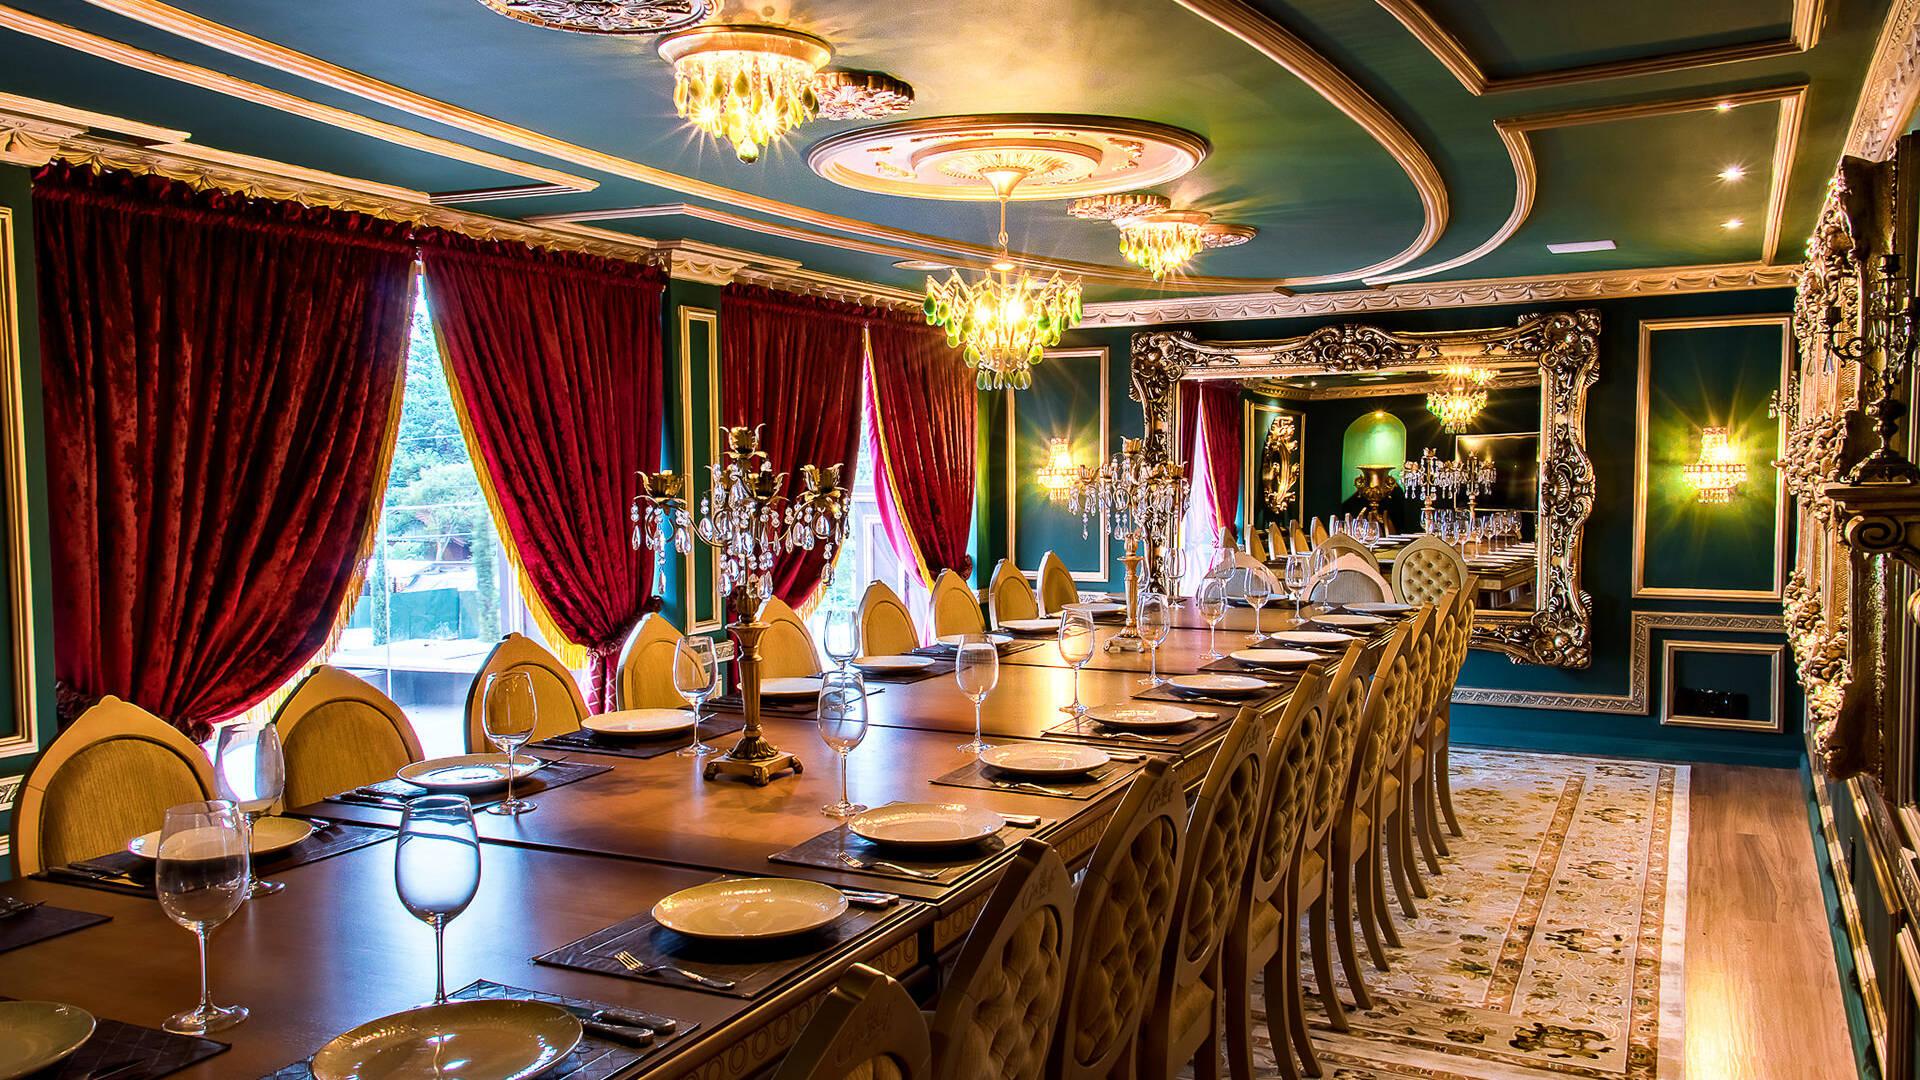 Restaurante e Gastrobar de George III